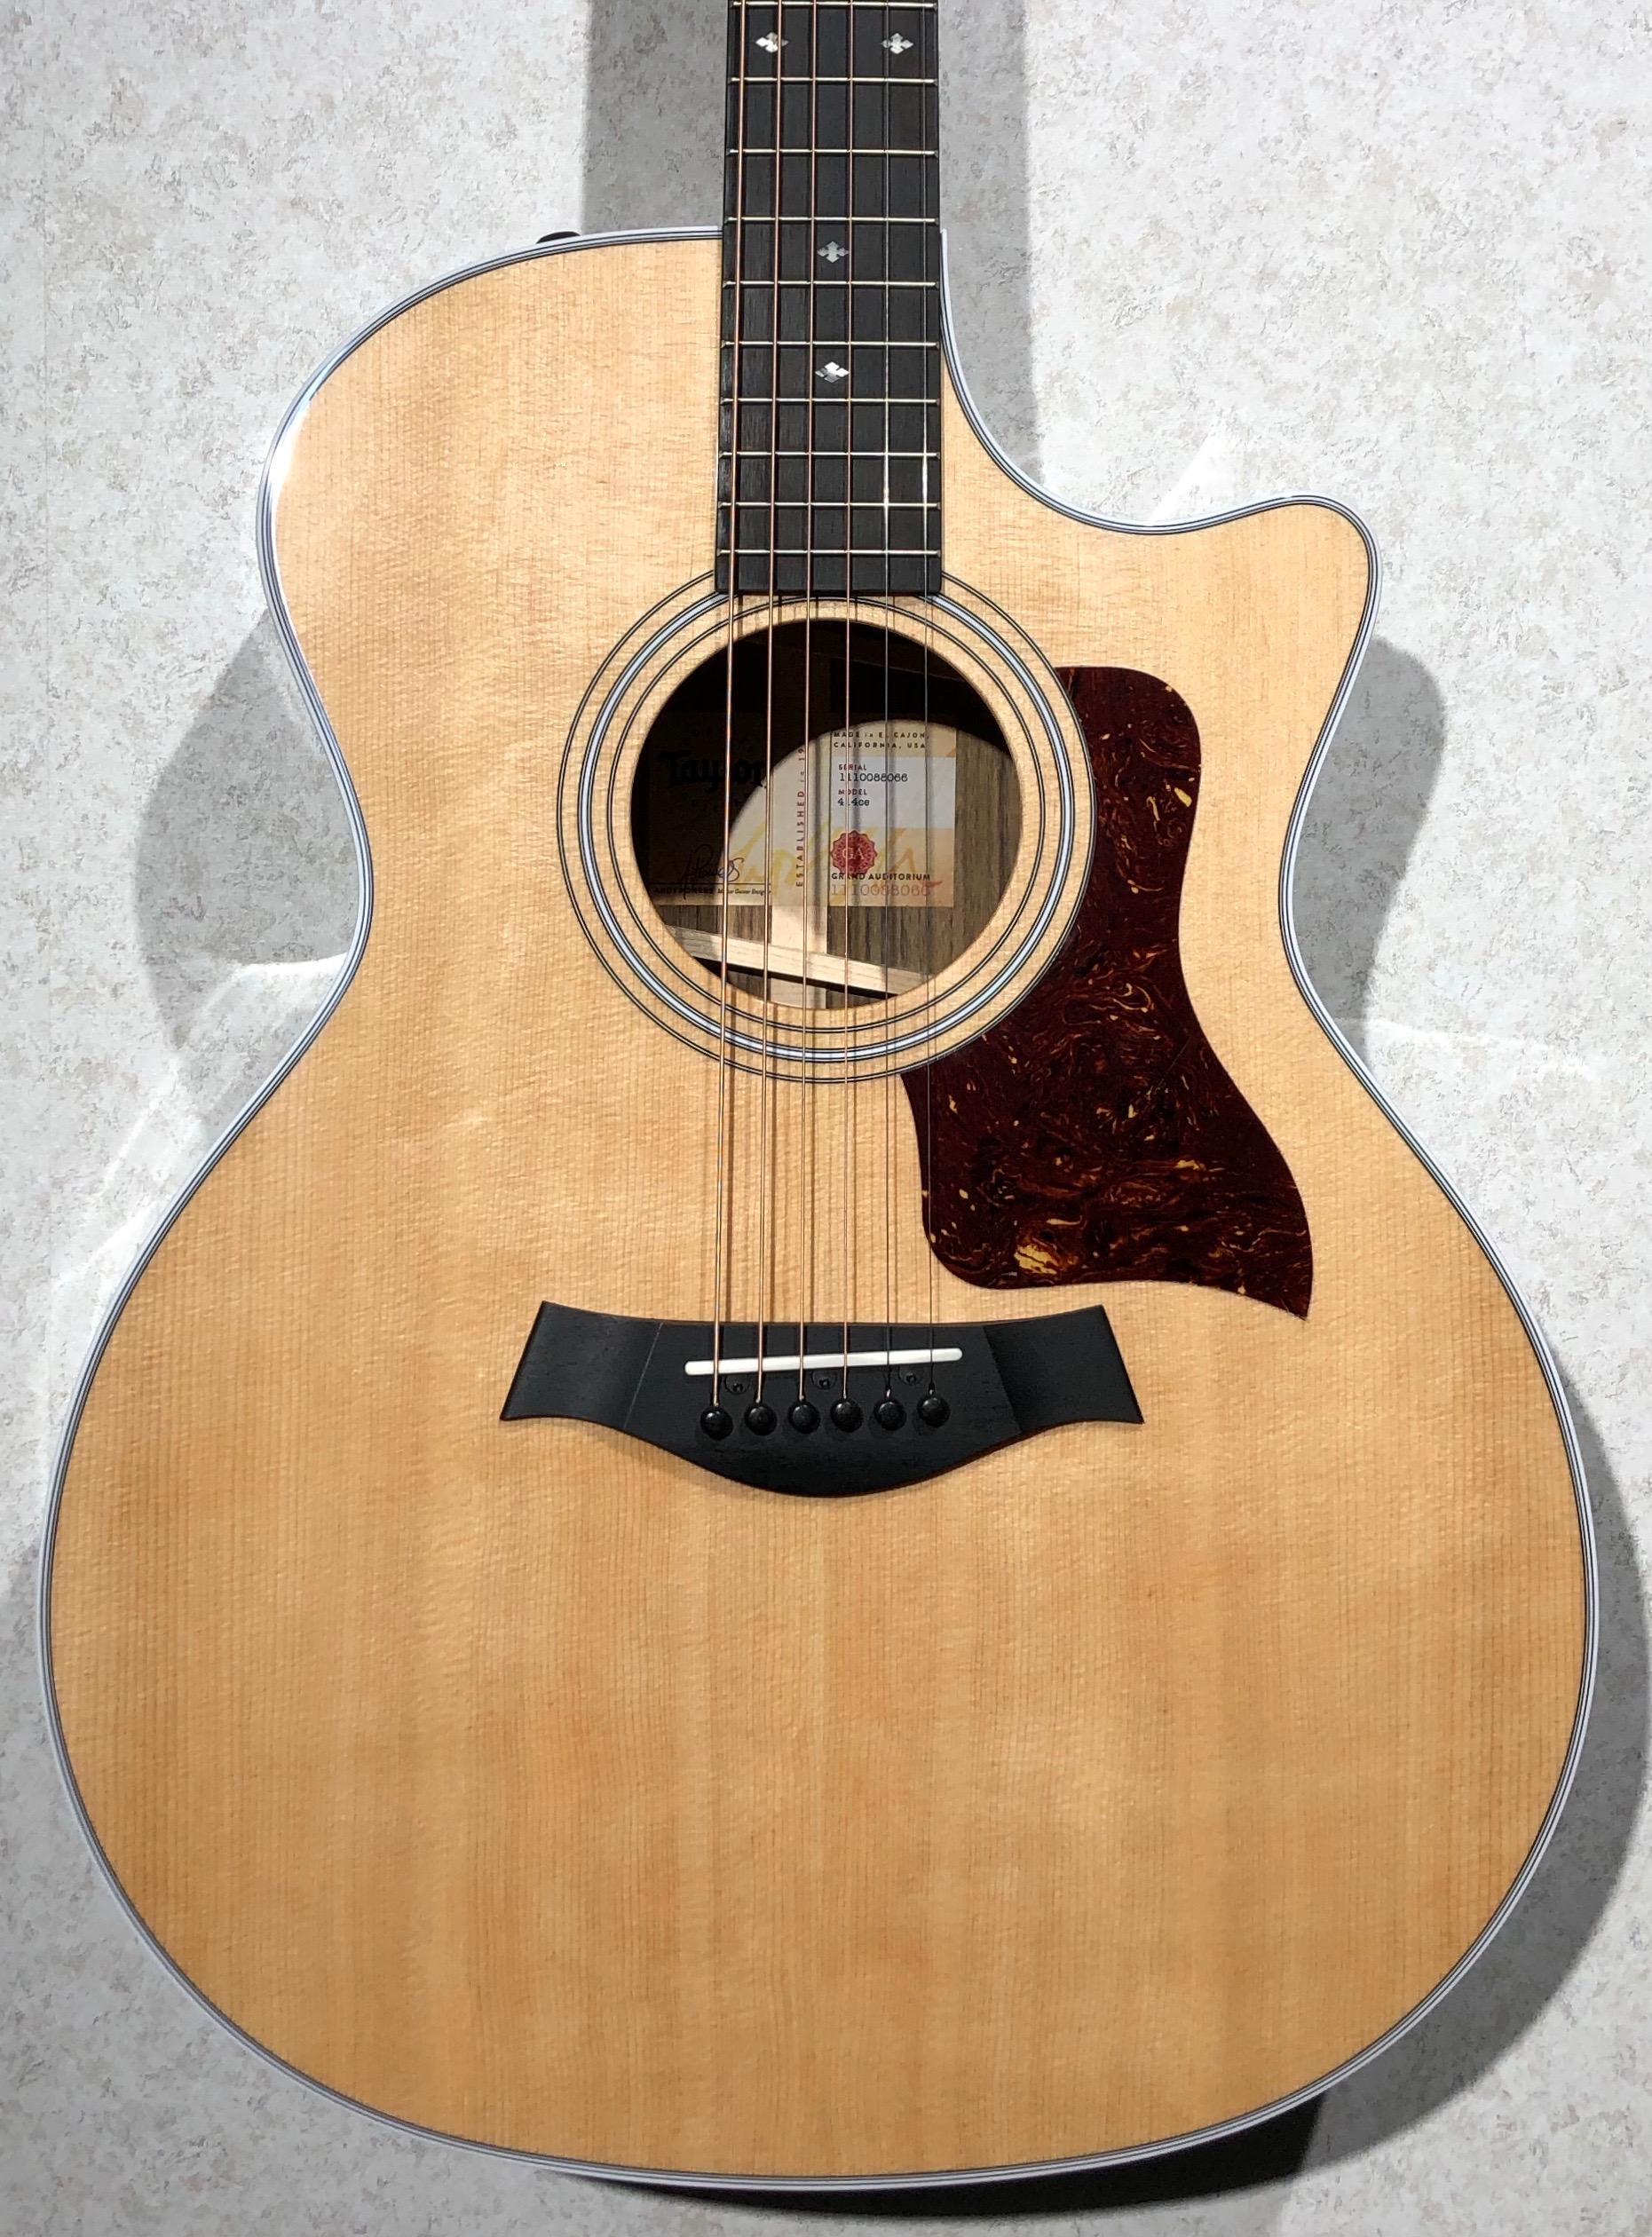 taylor guitars 414ce v class legacy music. Black Bedroom Furniture Sets. Home Design Ideas